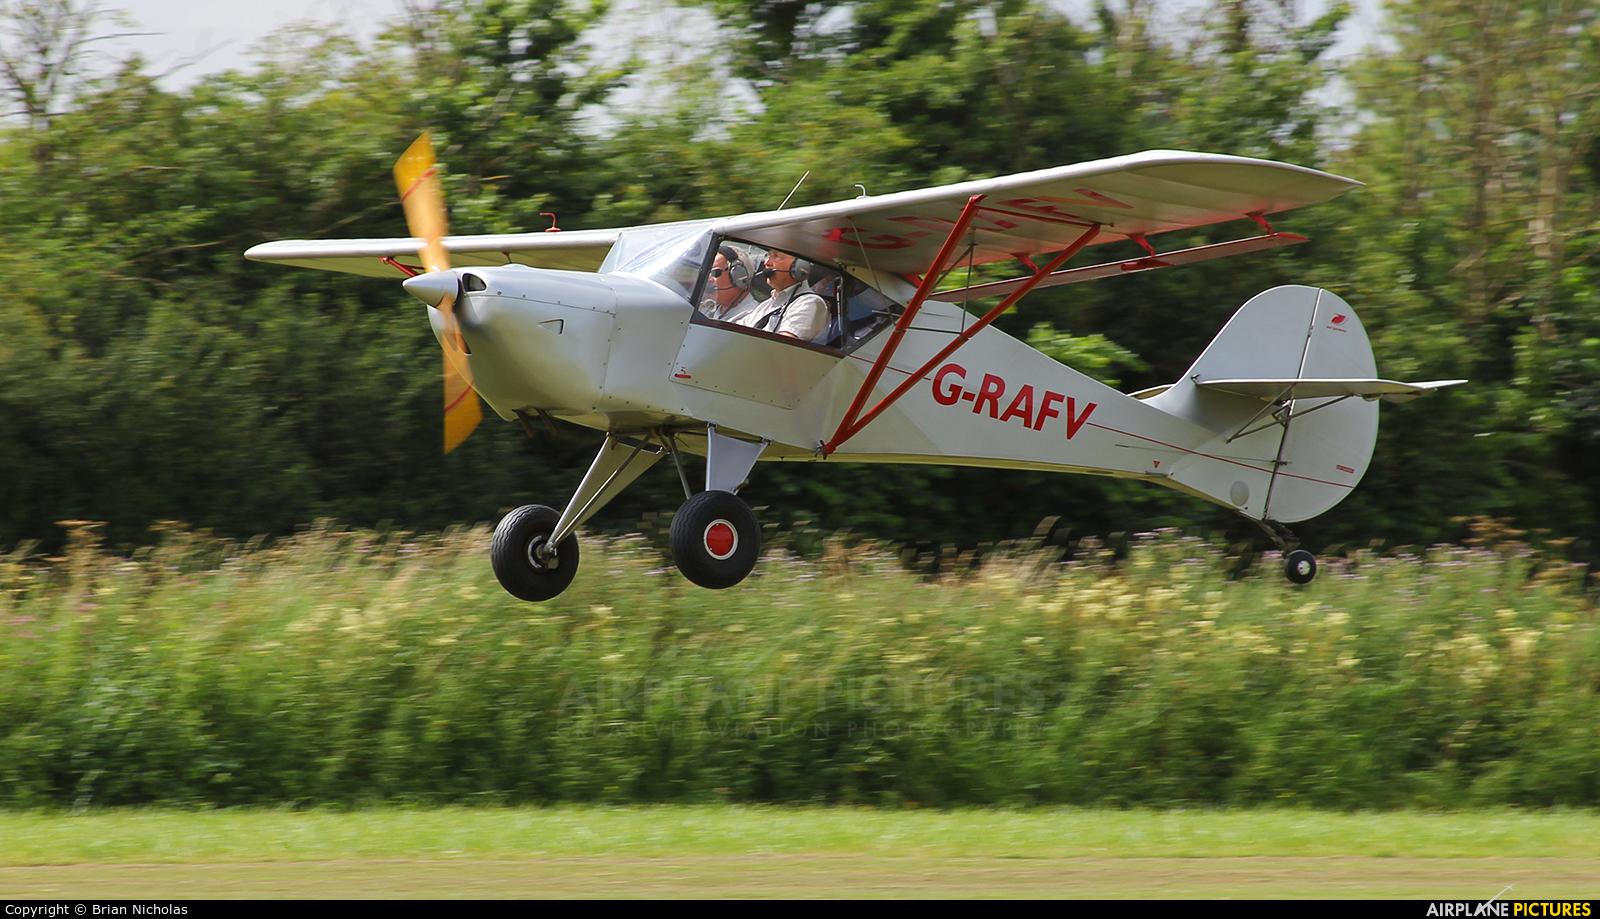 Private G-RAFV aircraft at Stoke Golding